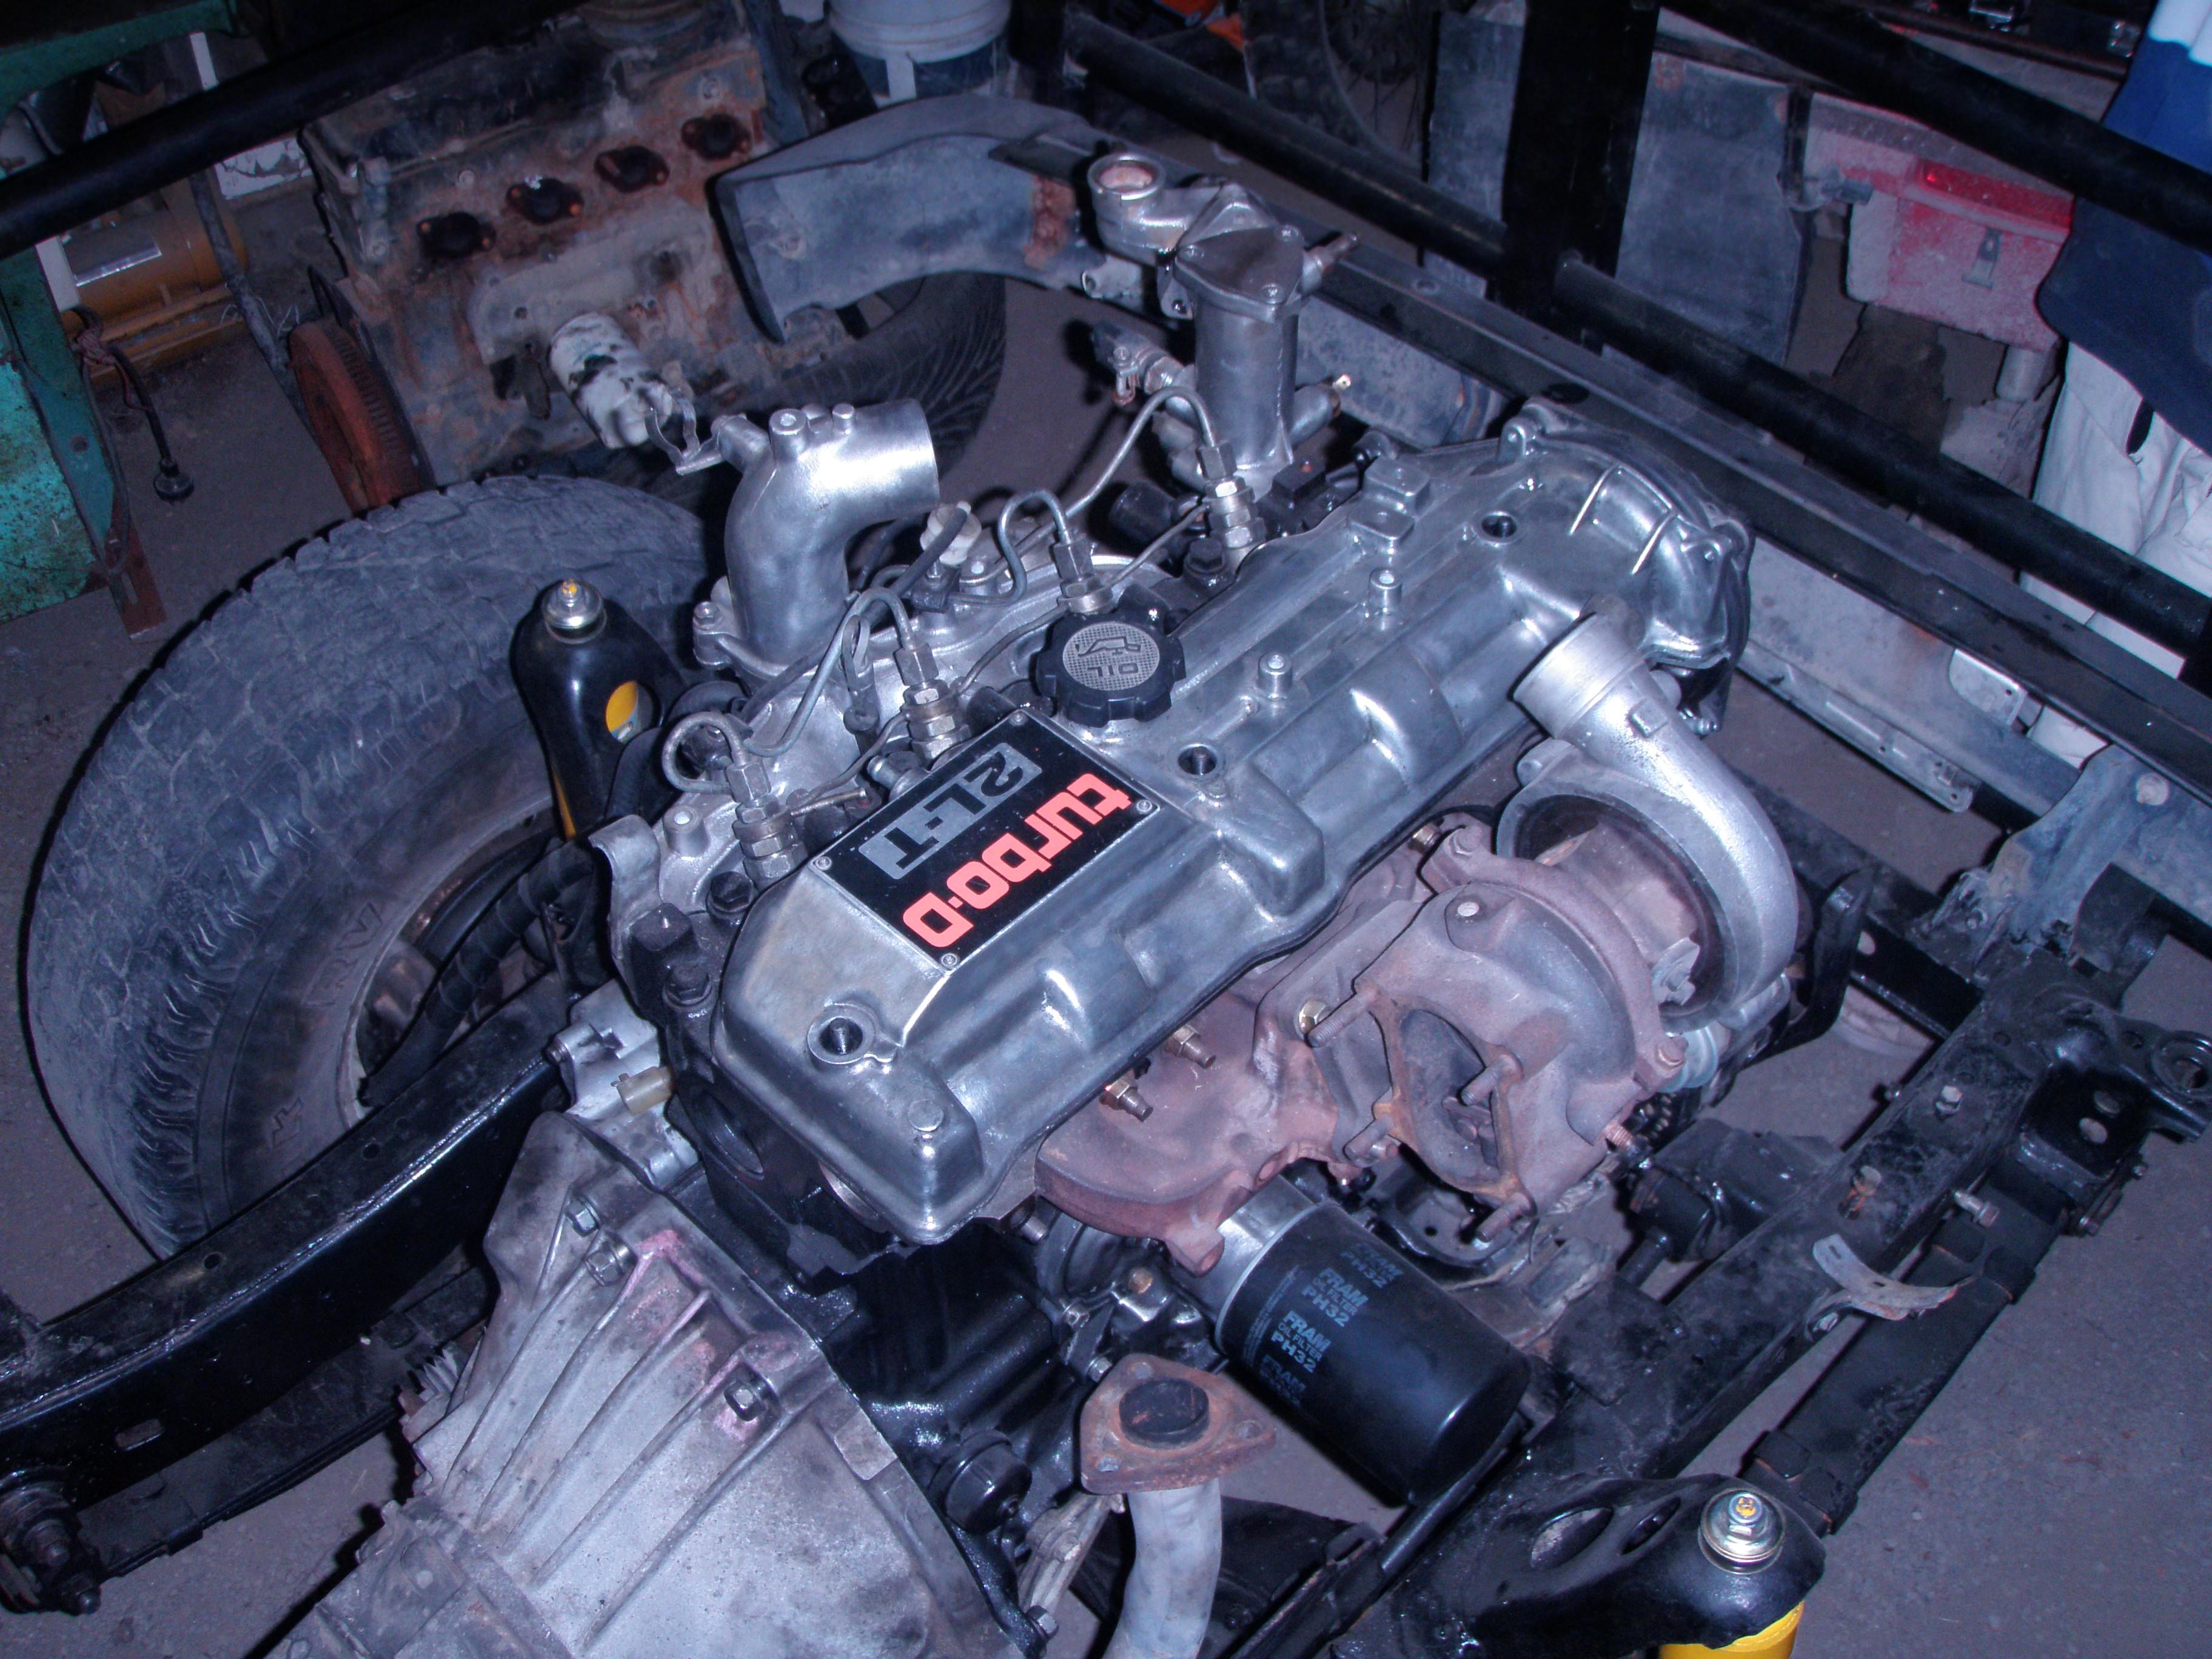 Toyota hilux Engine in Hilux Vs. Isuzu DMax